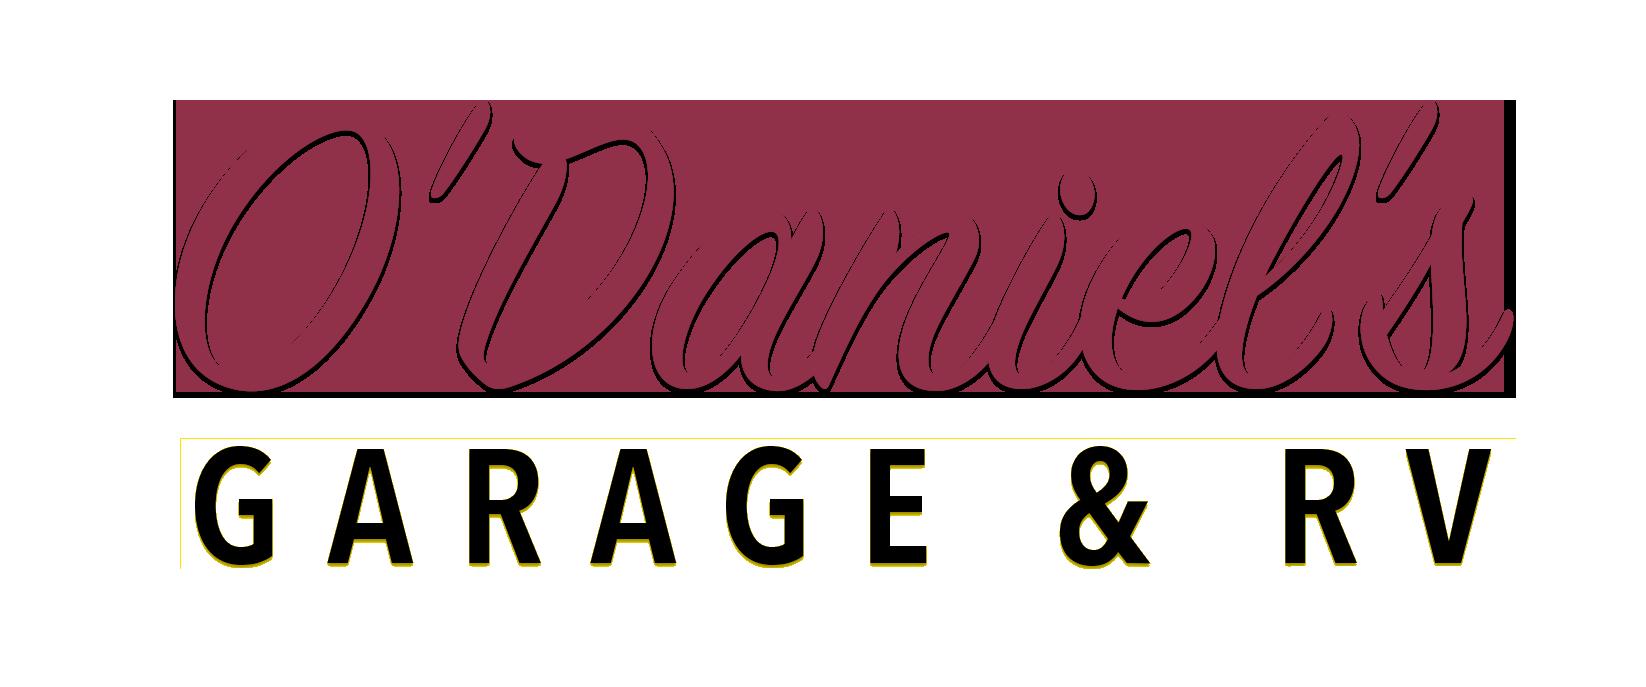 O'Daniel's Garage & RV